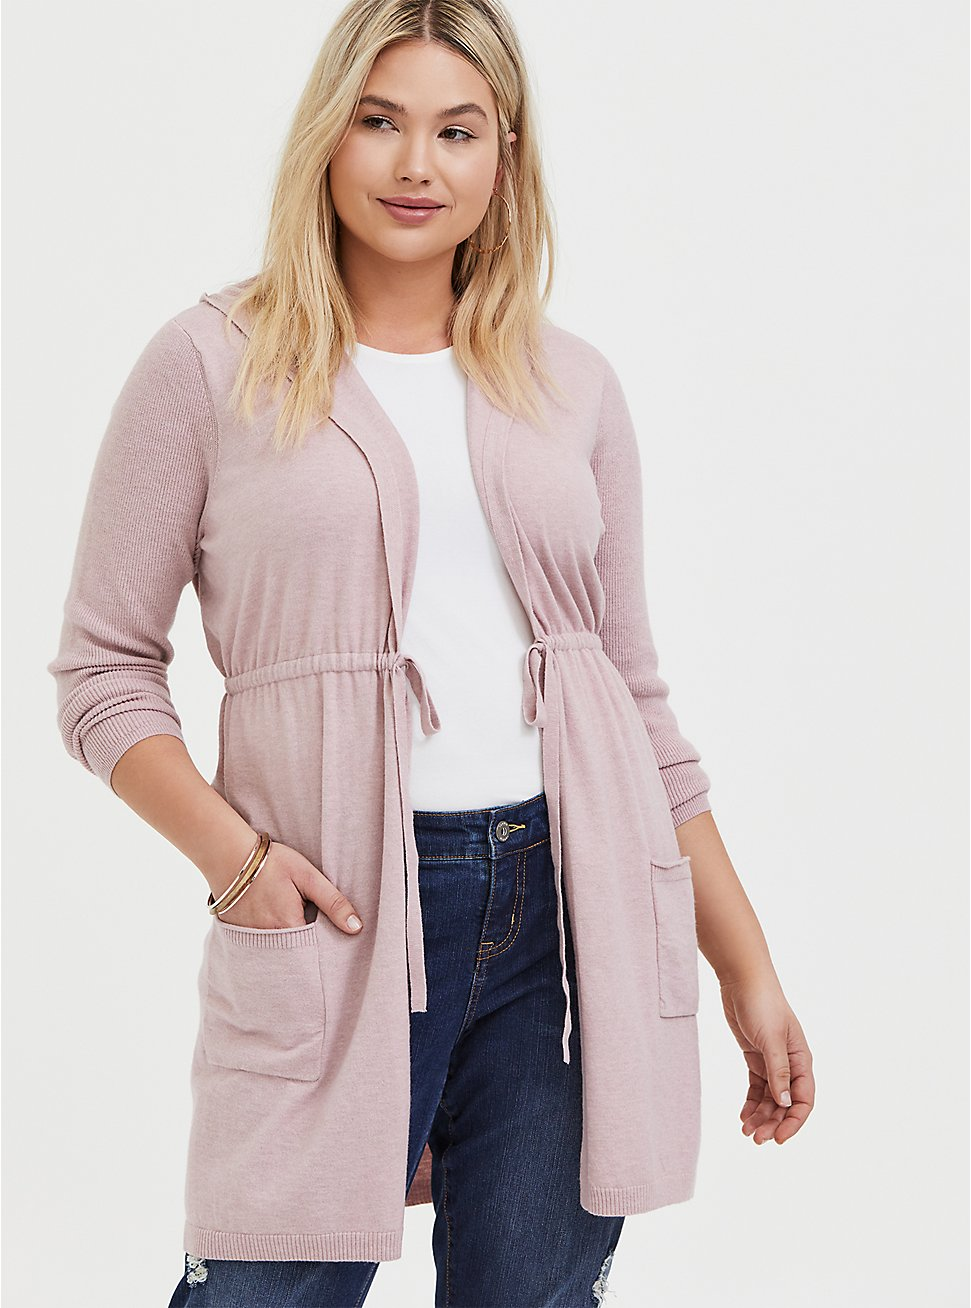 Plus Size Mauve Pink Brushed Hooded Anorak Cardigan, PALE MAUVE, hi-res